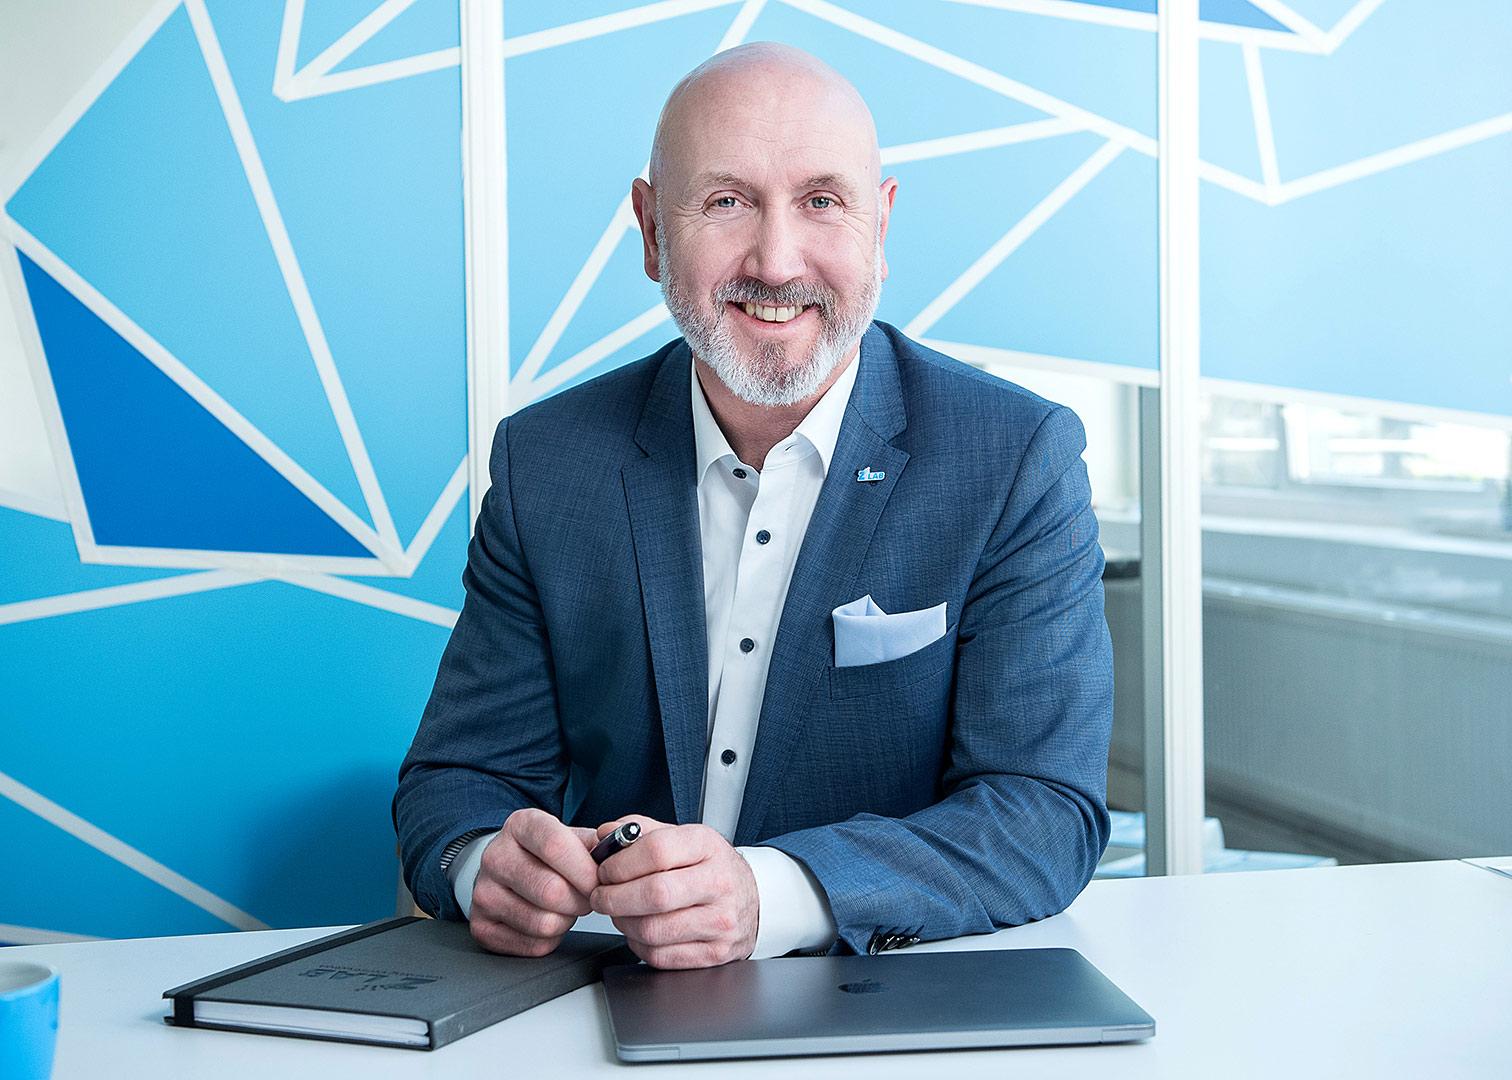 Ihr neues Business Profilbild | mobiler Fotograf Berlin